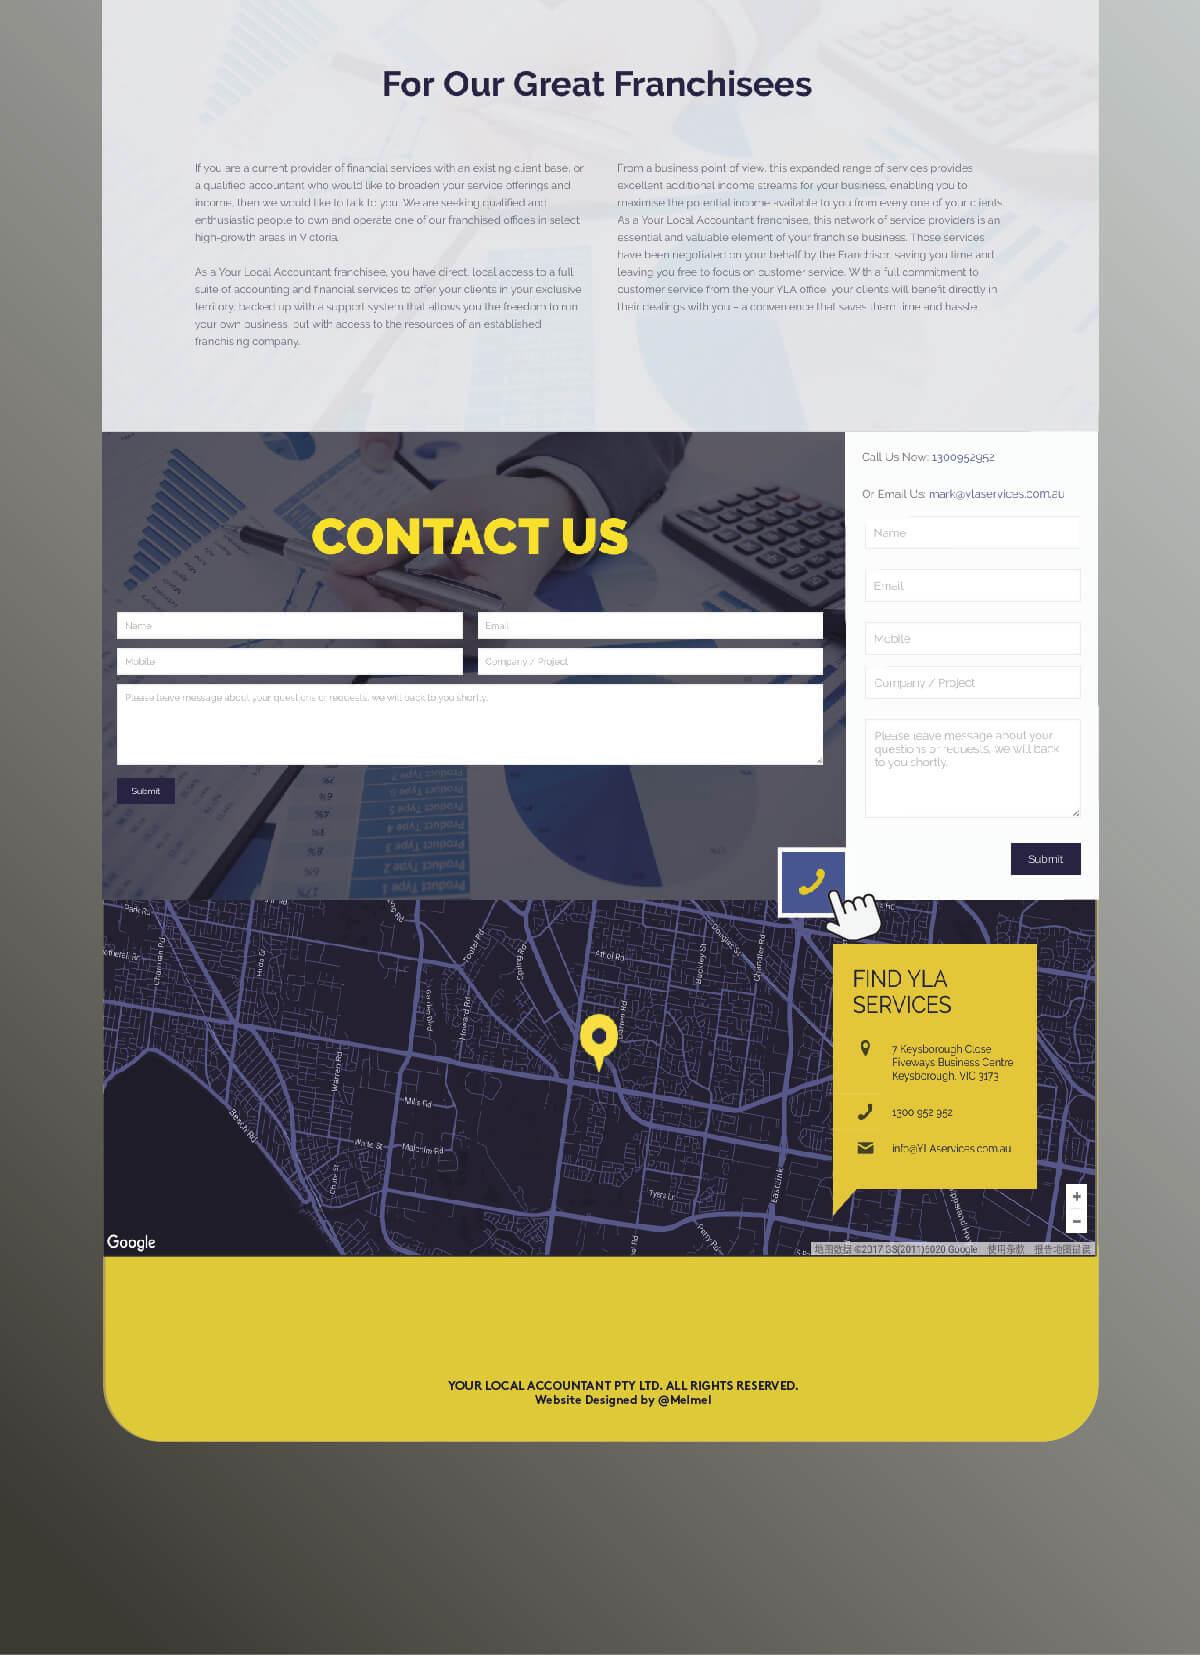 墨尔本 YLA Services 网站设计